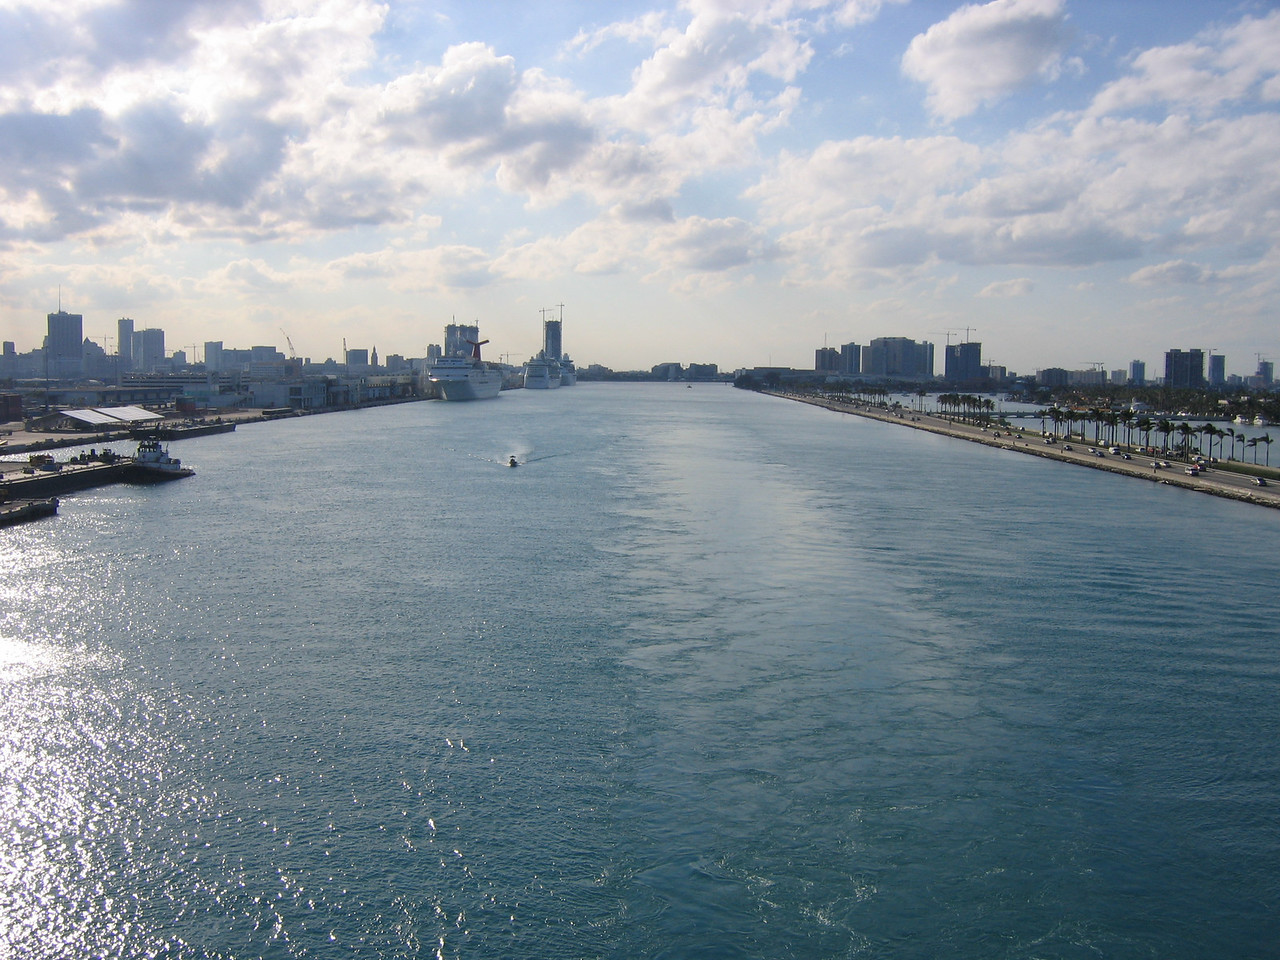 Looking back at Miami.